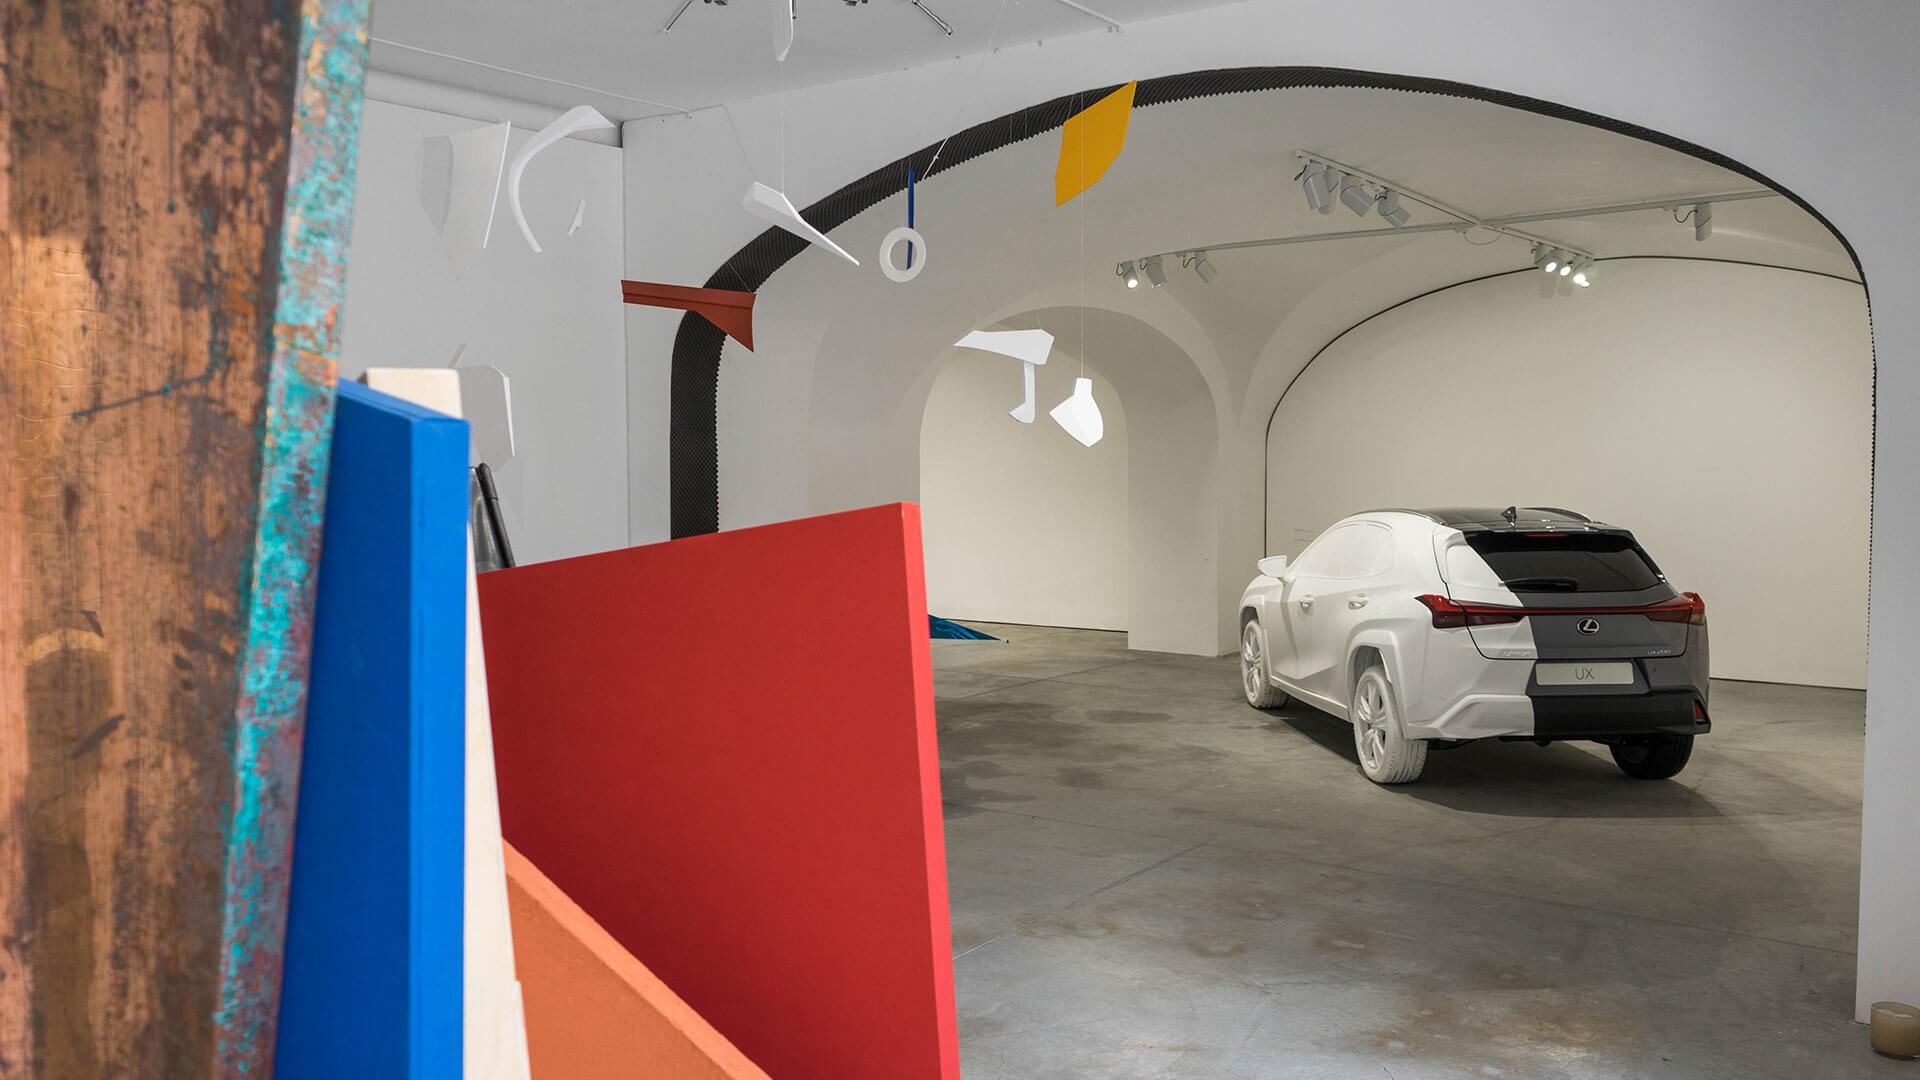 2018 lexus ux lisbon gallery 033